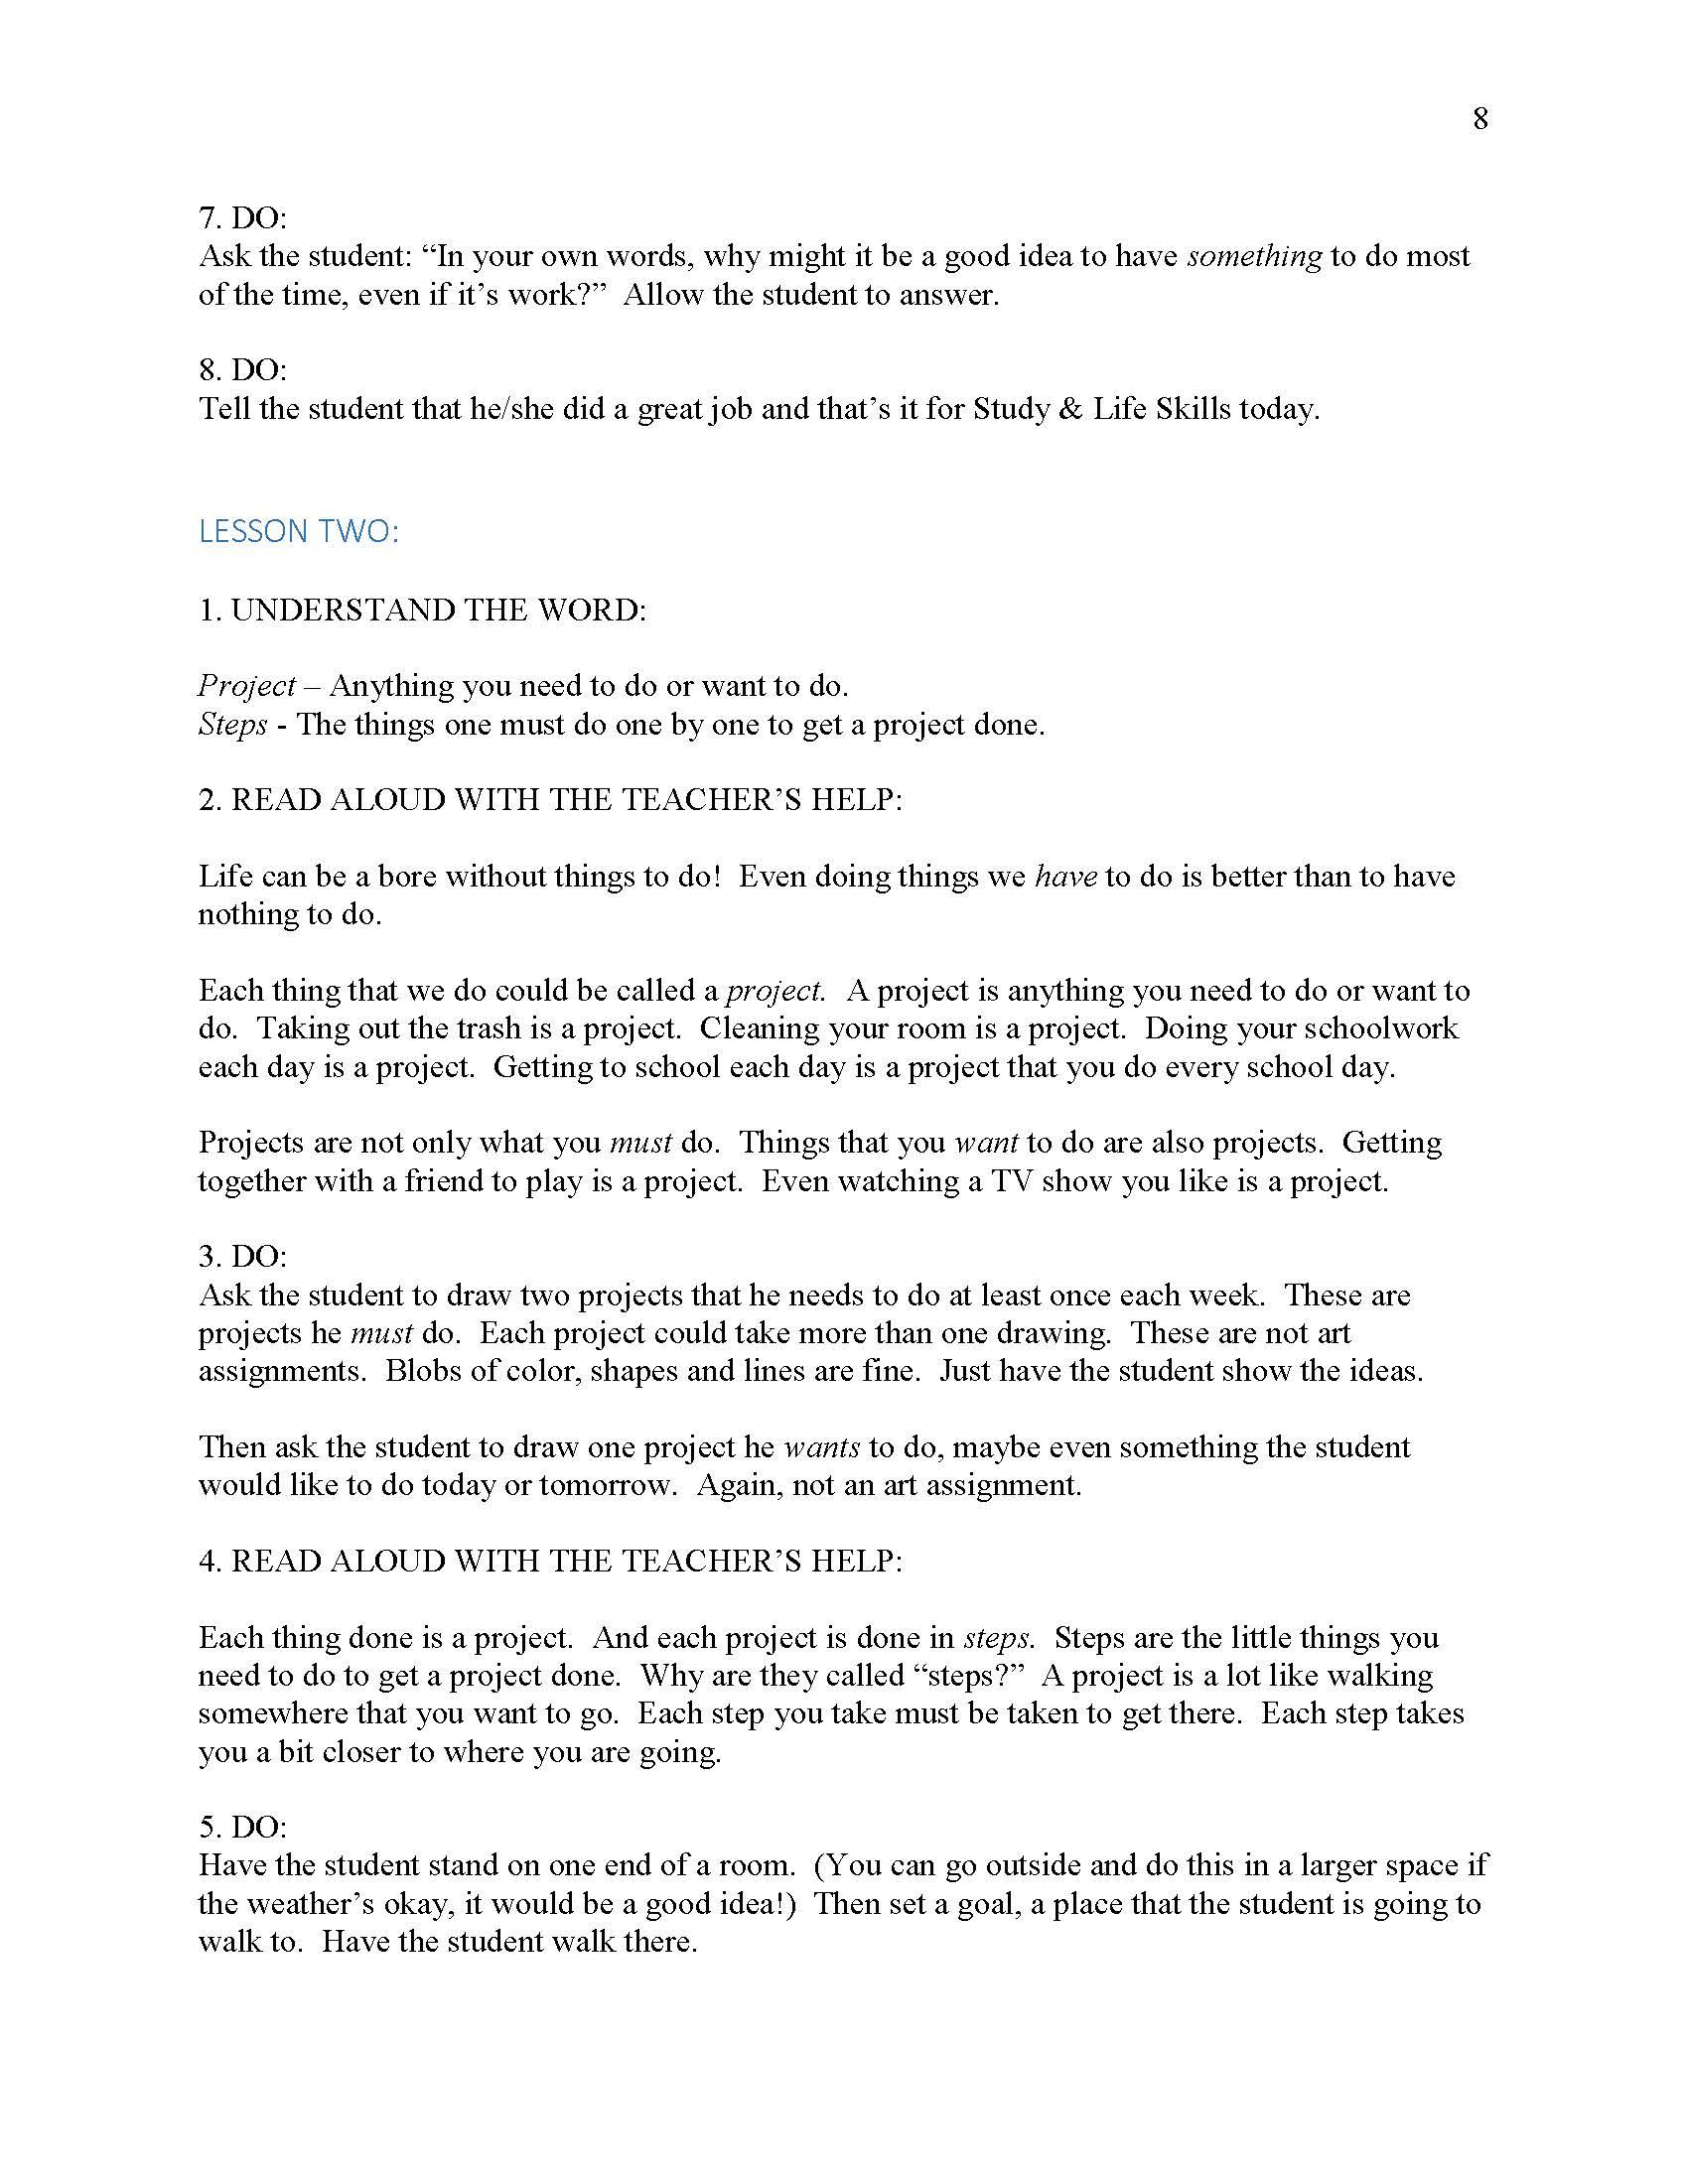 Step 1 Study & Life Skills 5 - Making Plans_Page_09.jpg